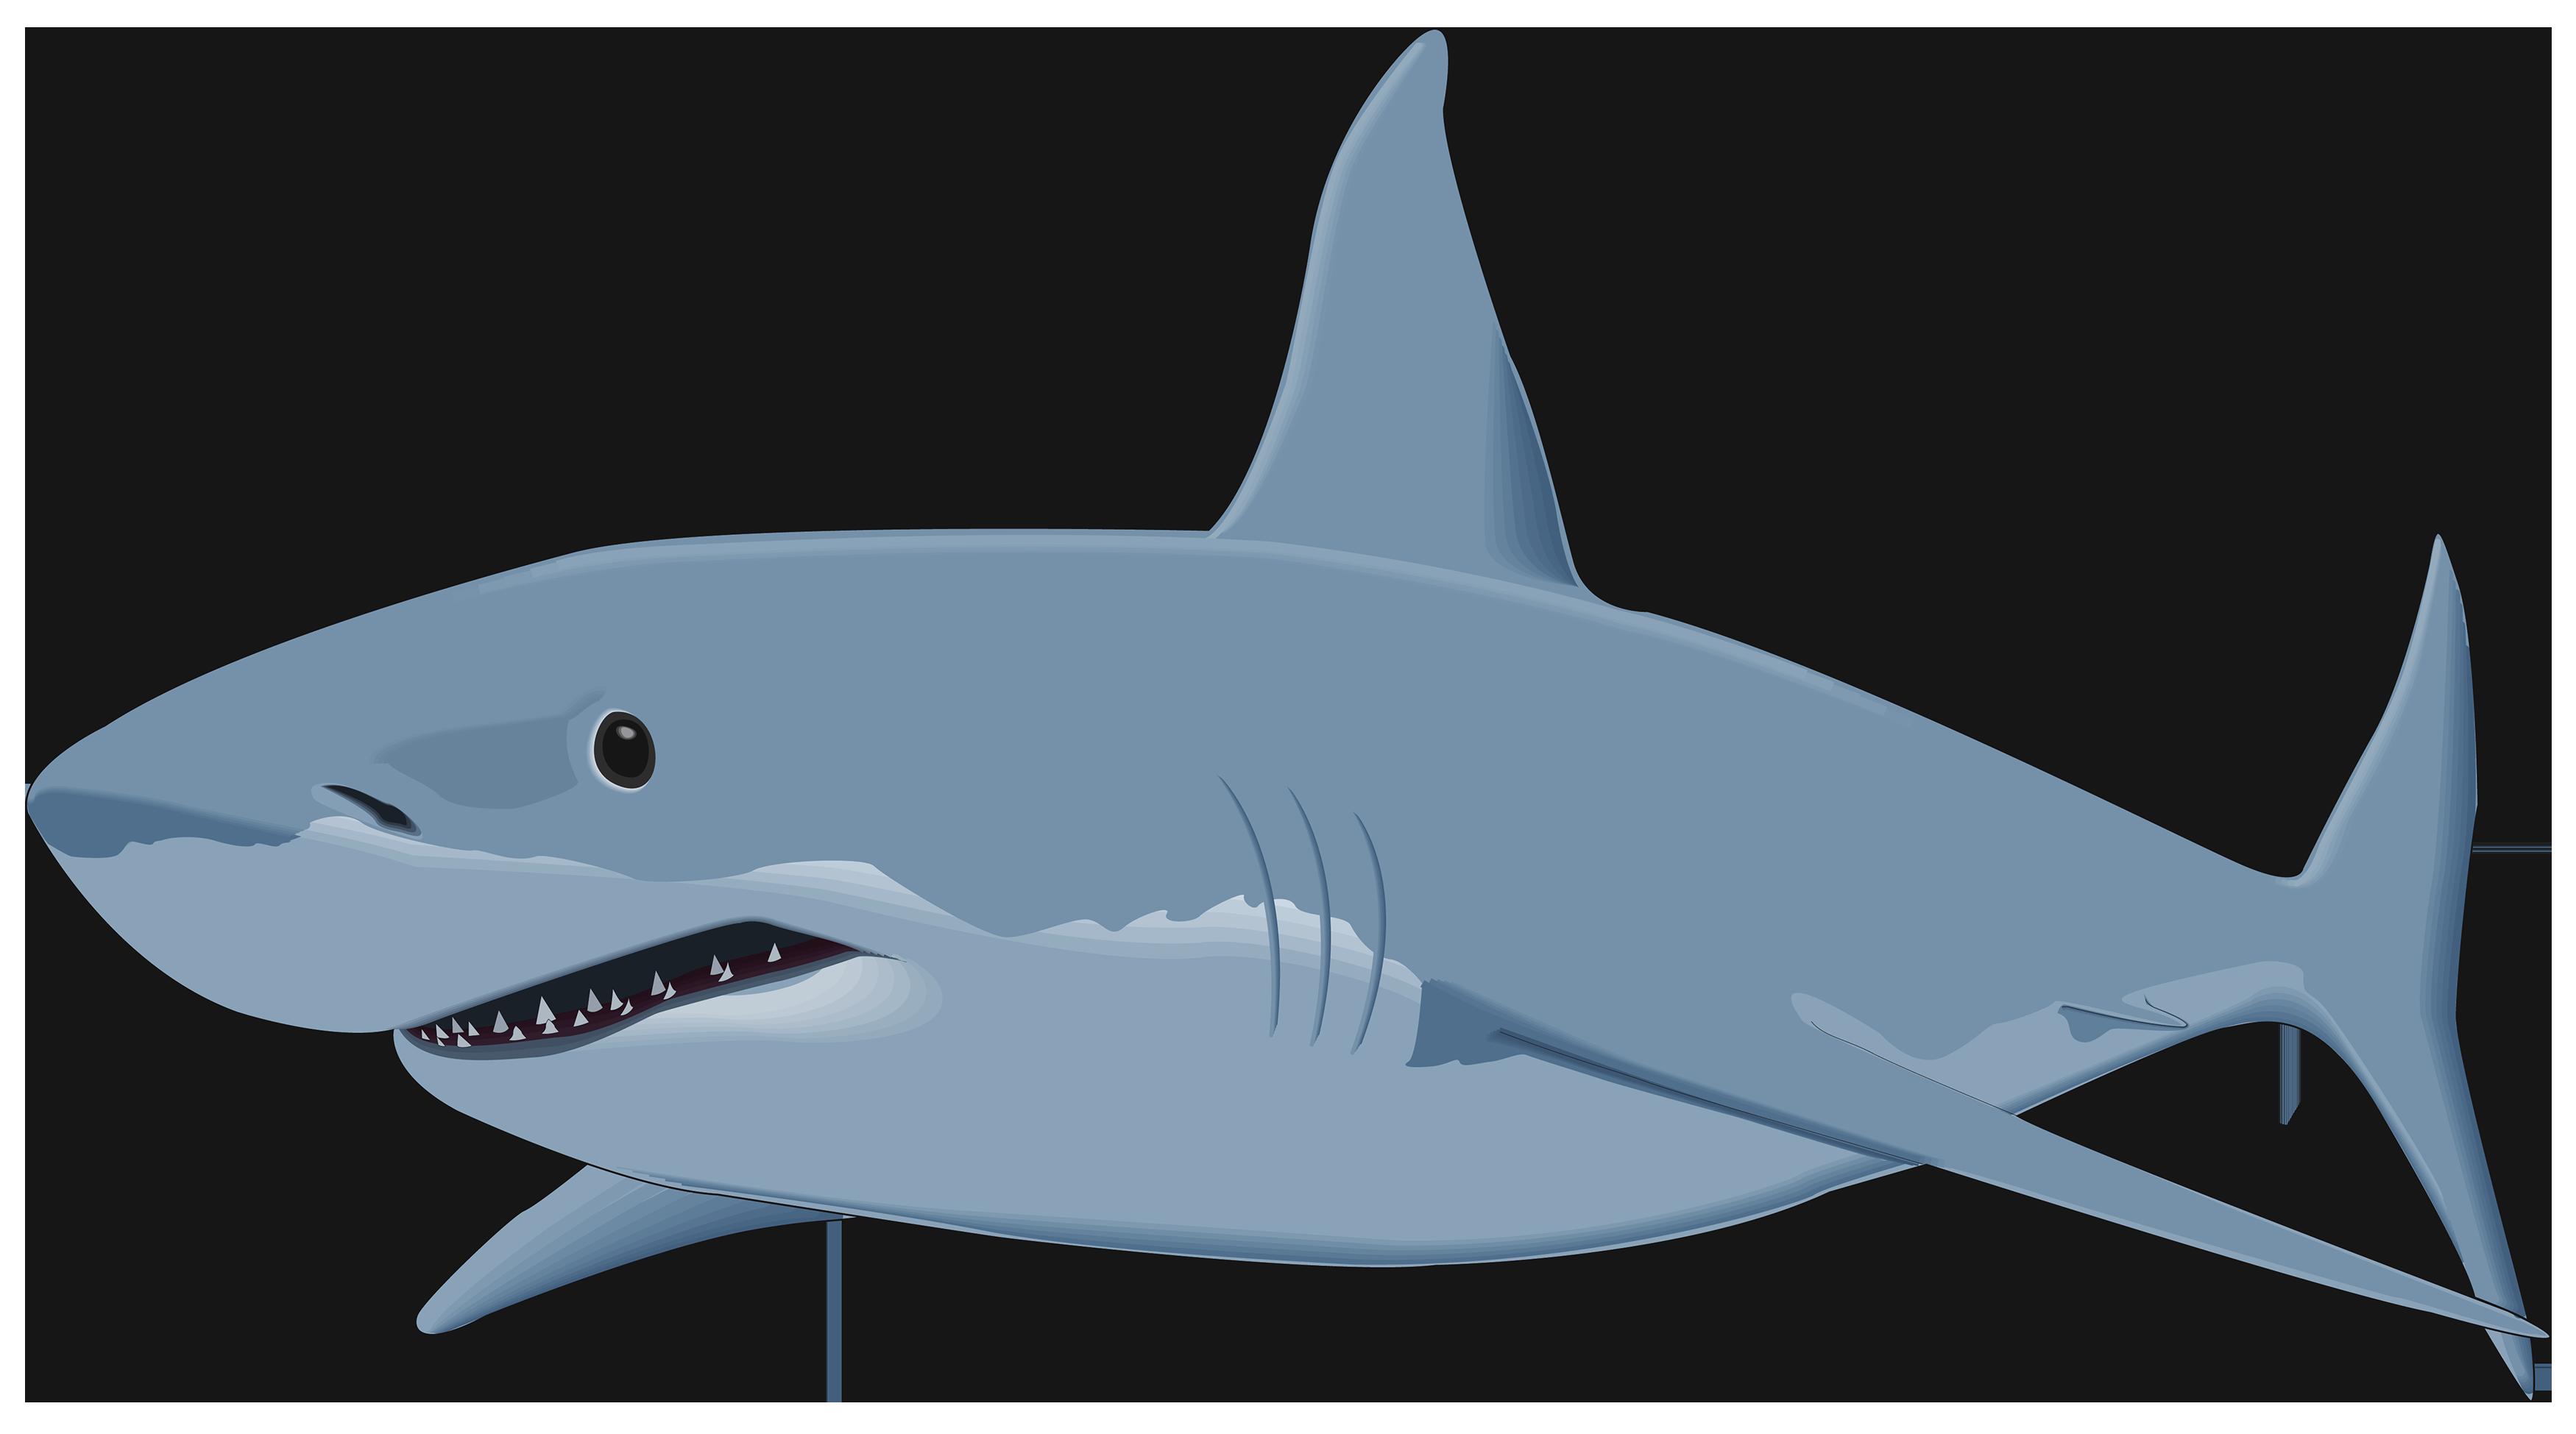 Shark png clipart.